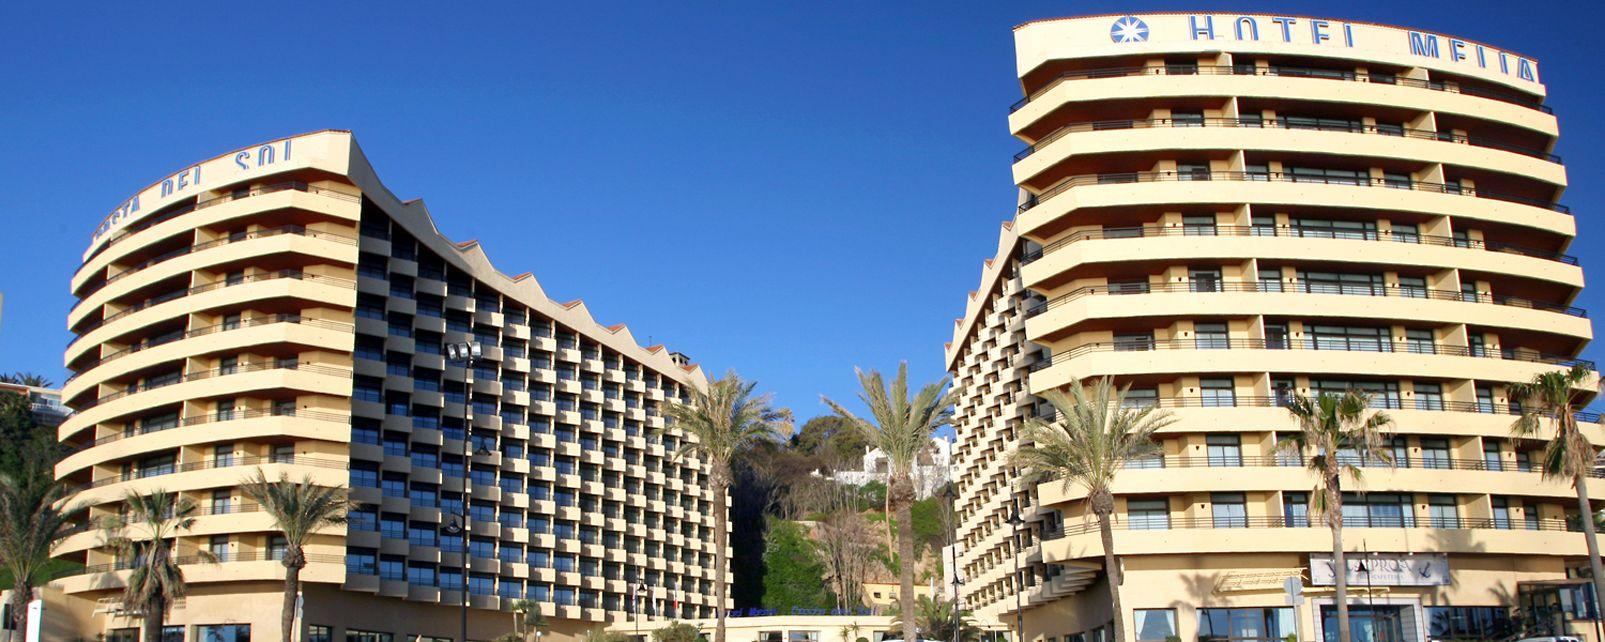 Melia Hotel Booking